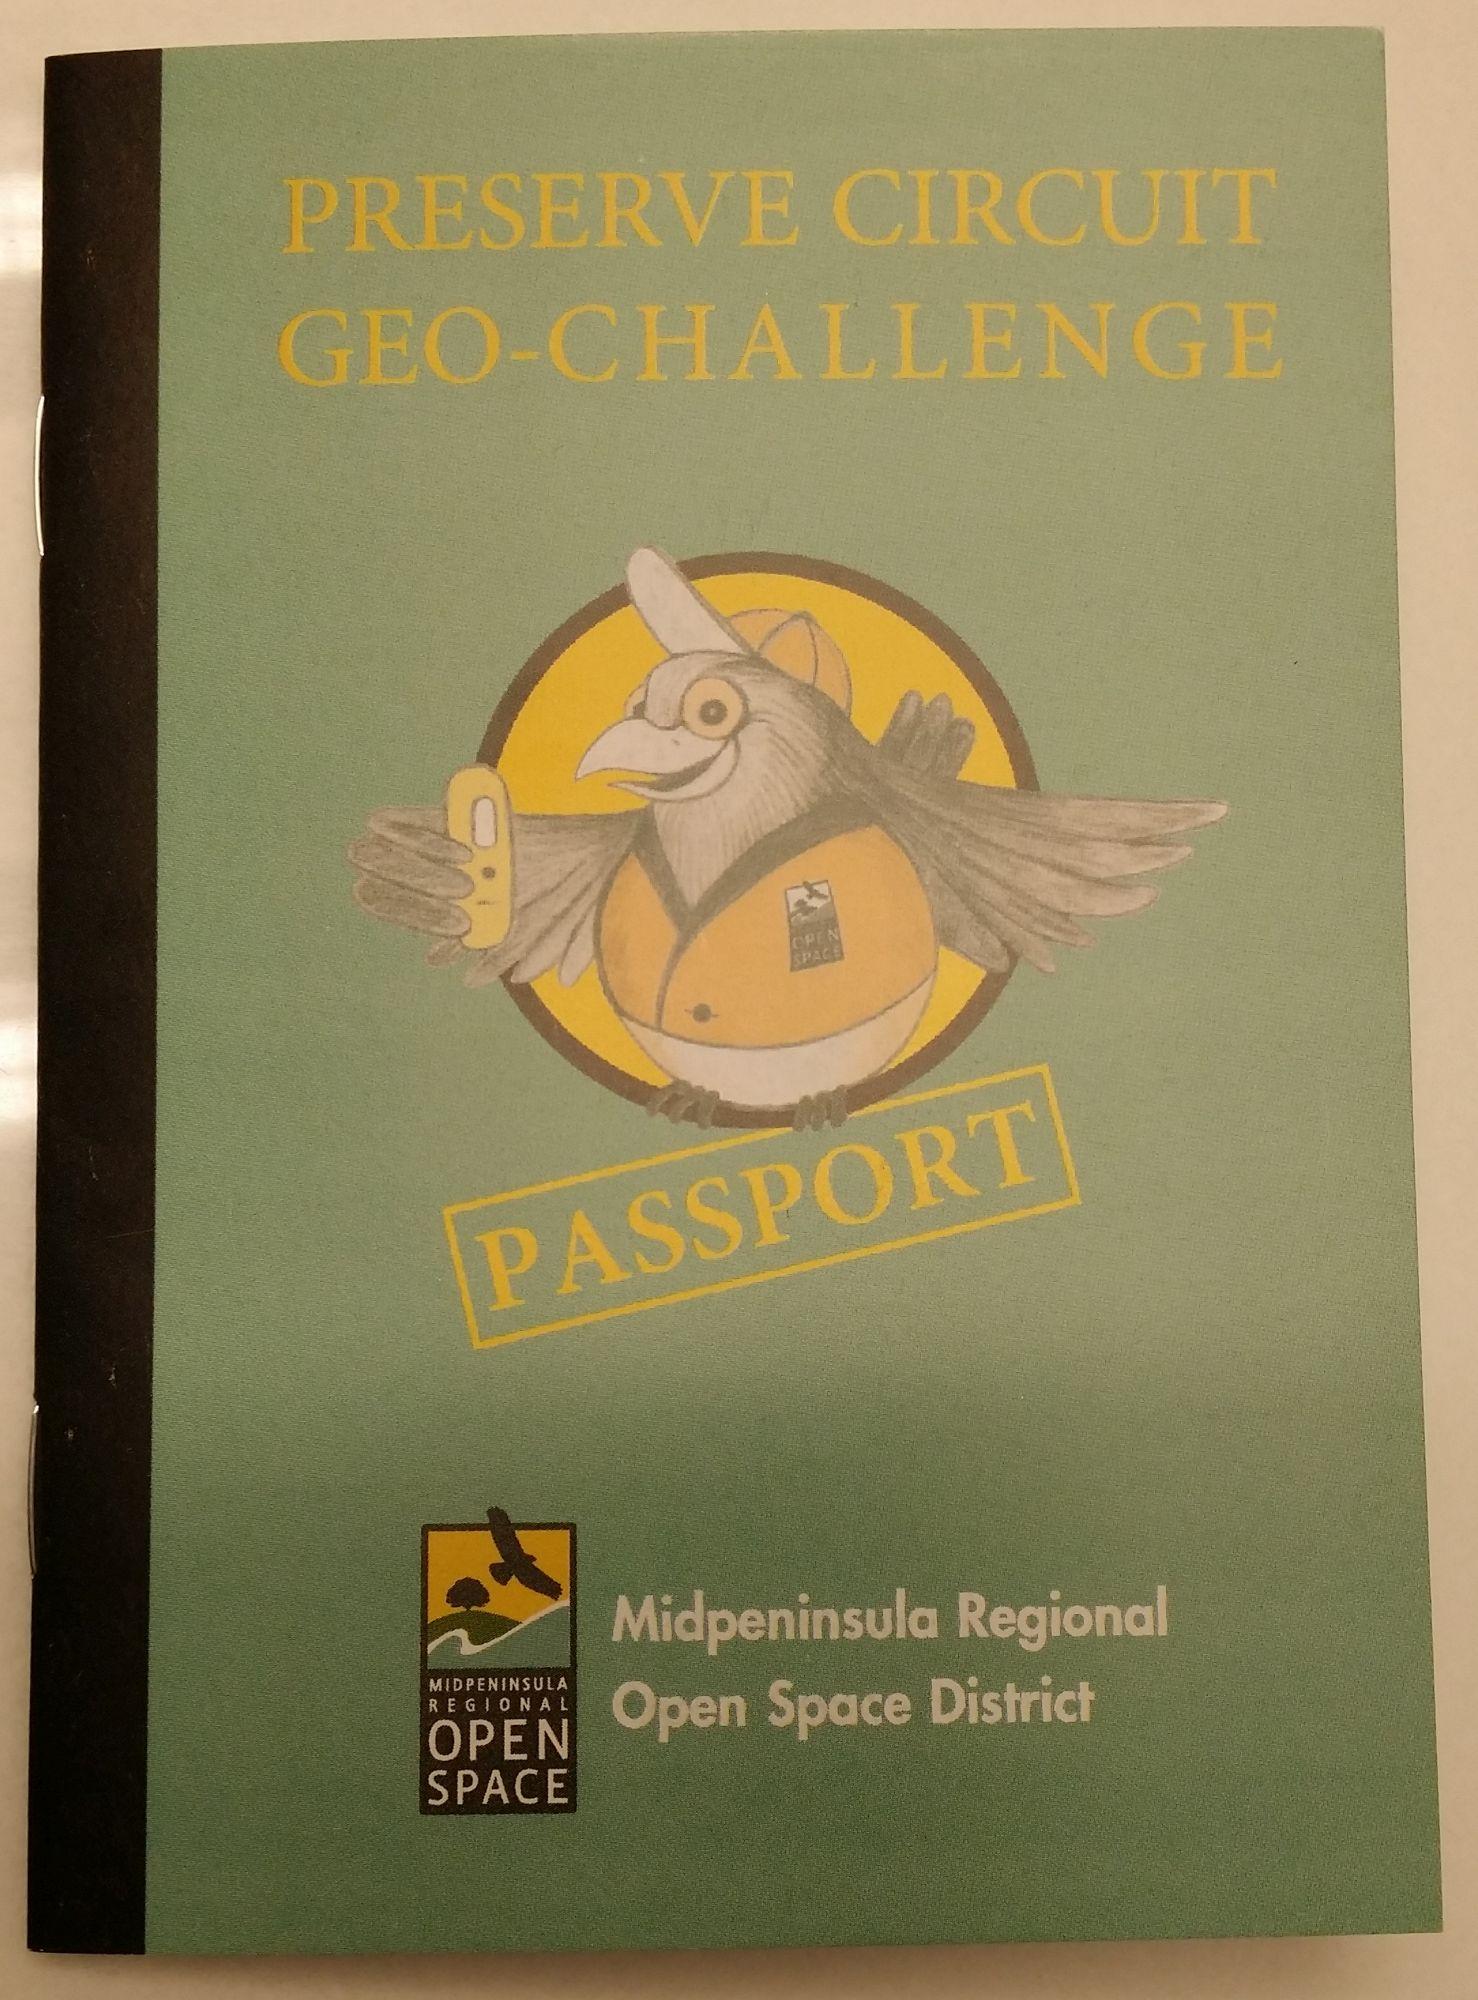 Midpeninsula Regional Open Space Preserve Circuit Geo Challenge